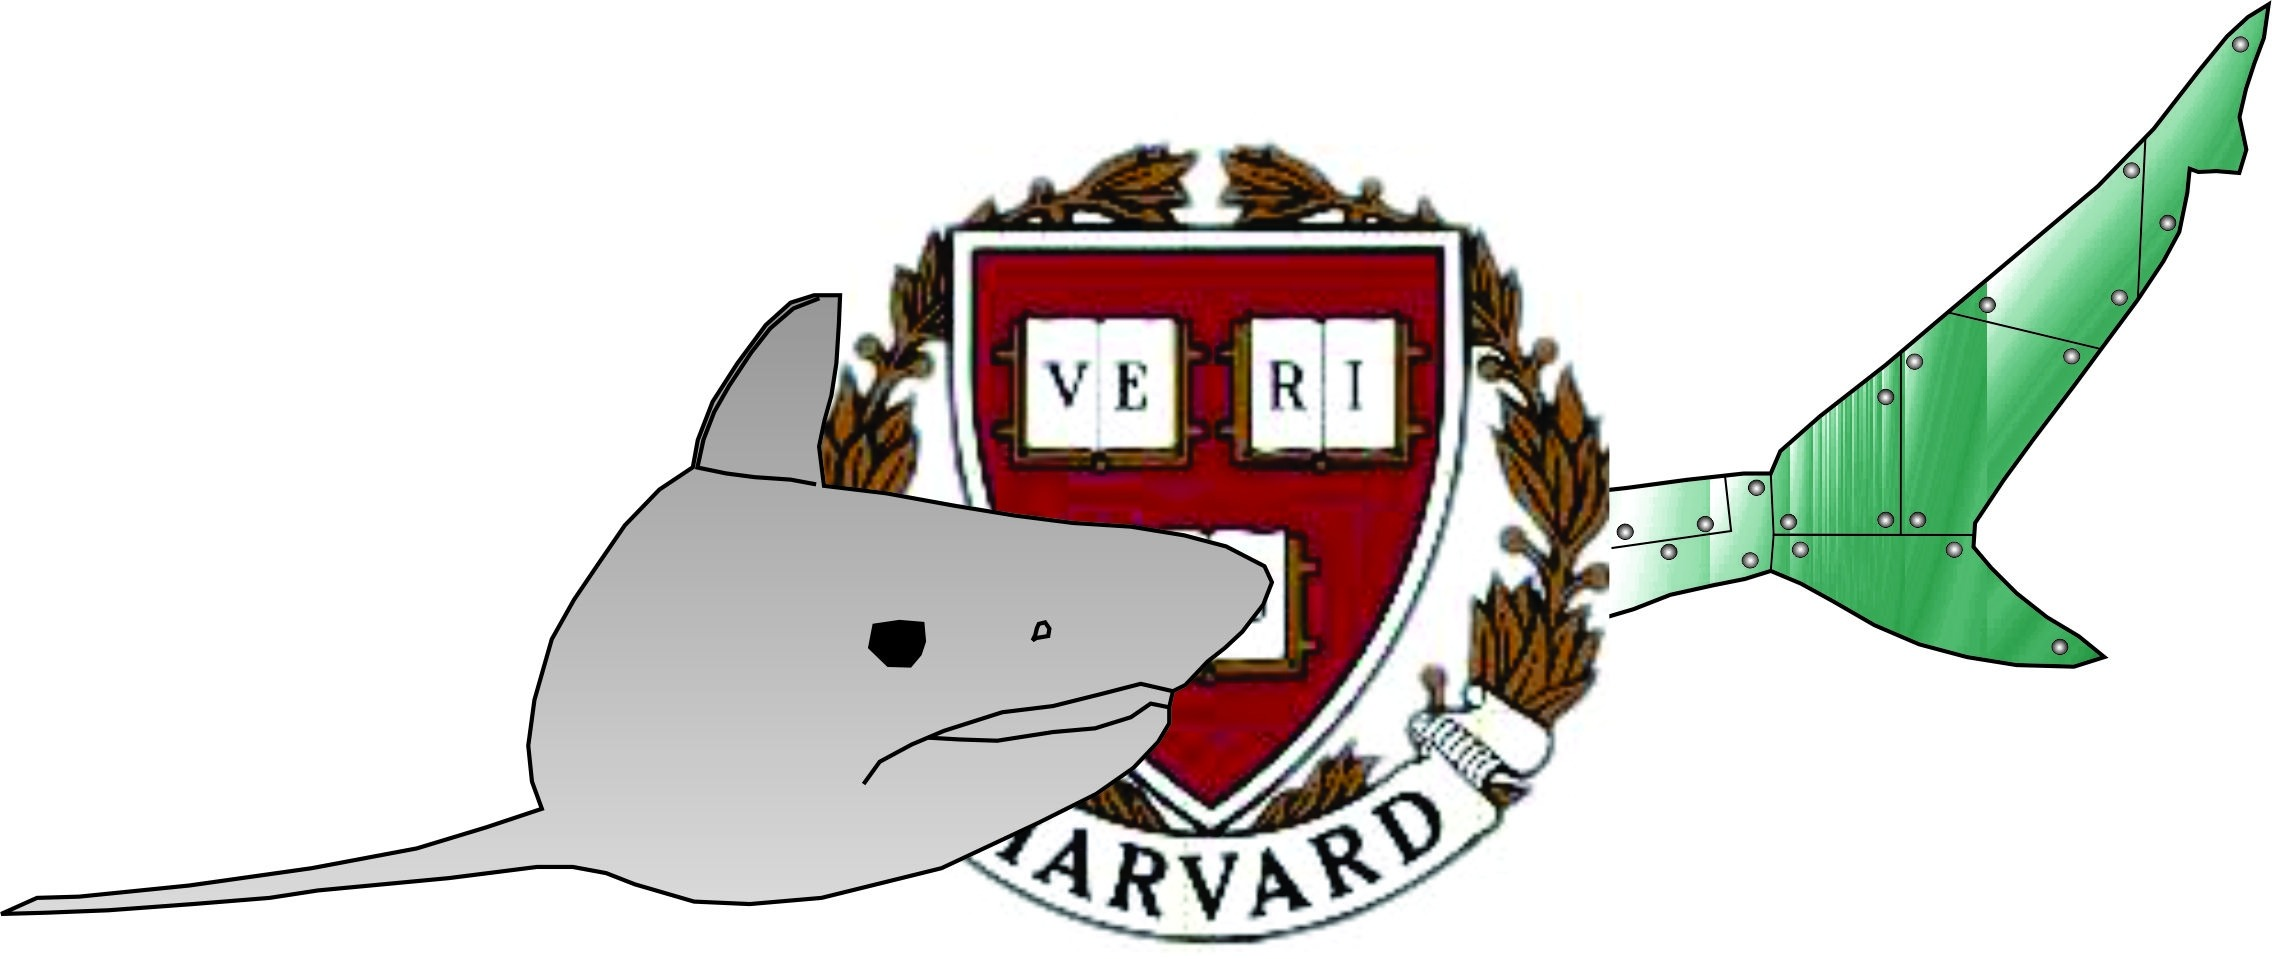 Fluid Locomotion research at Harvard University